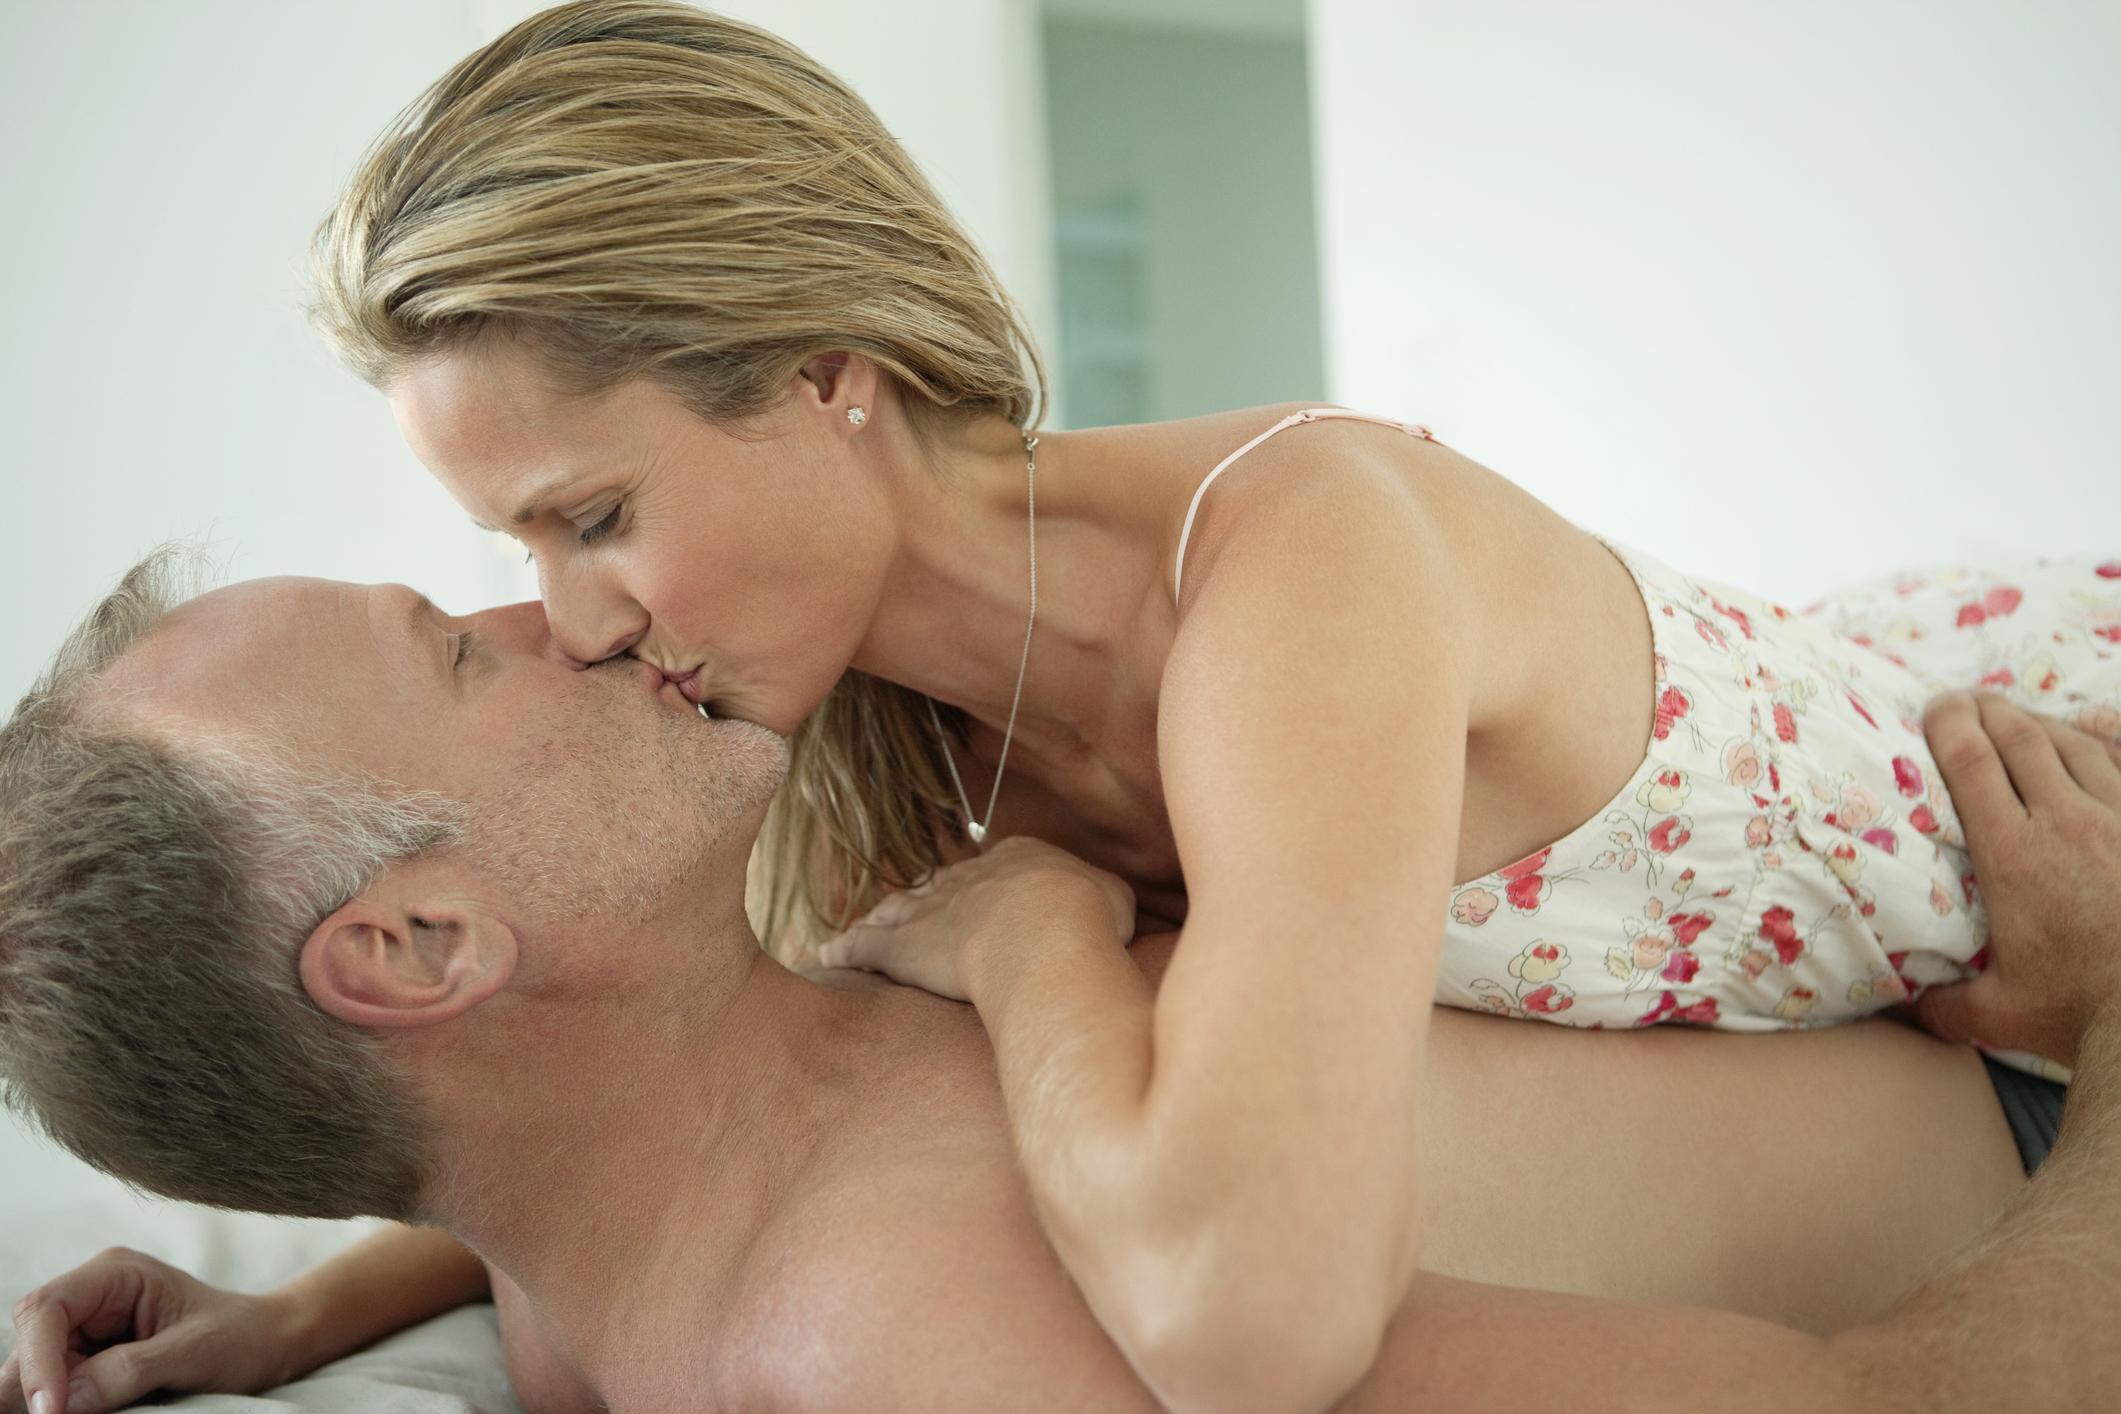 Sexe histoire profondément man milf free@todorazor.com